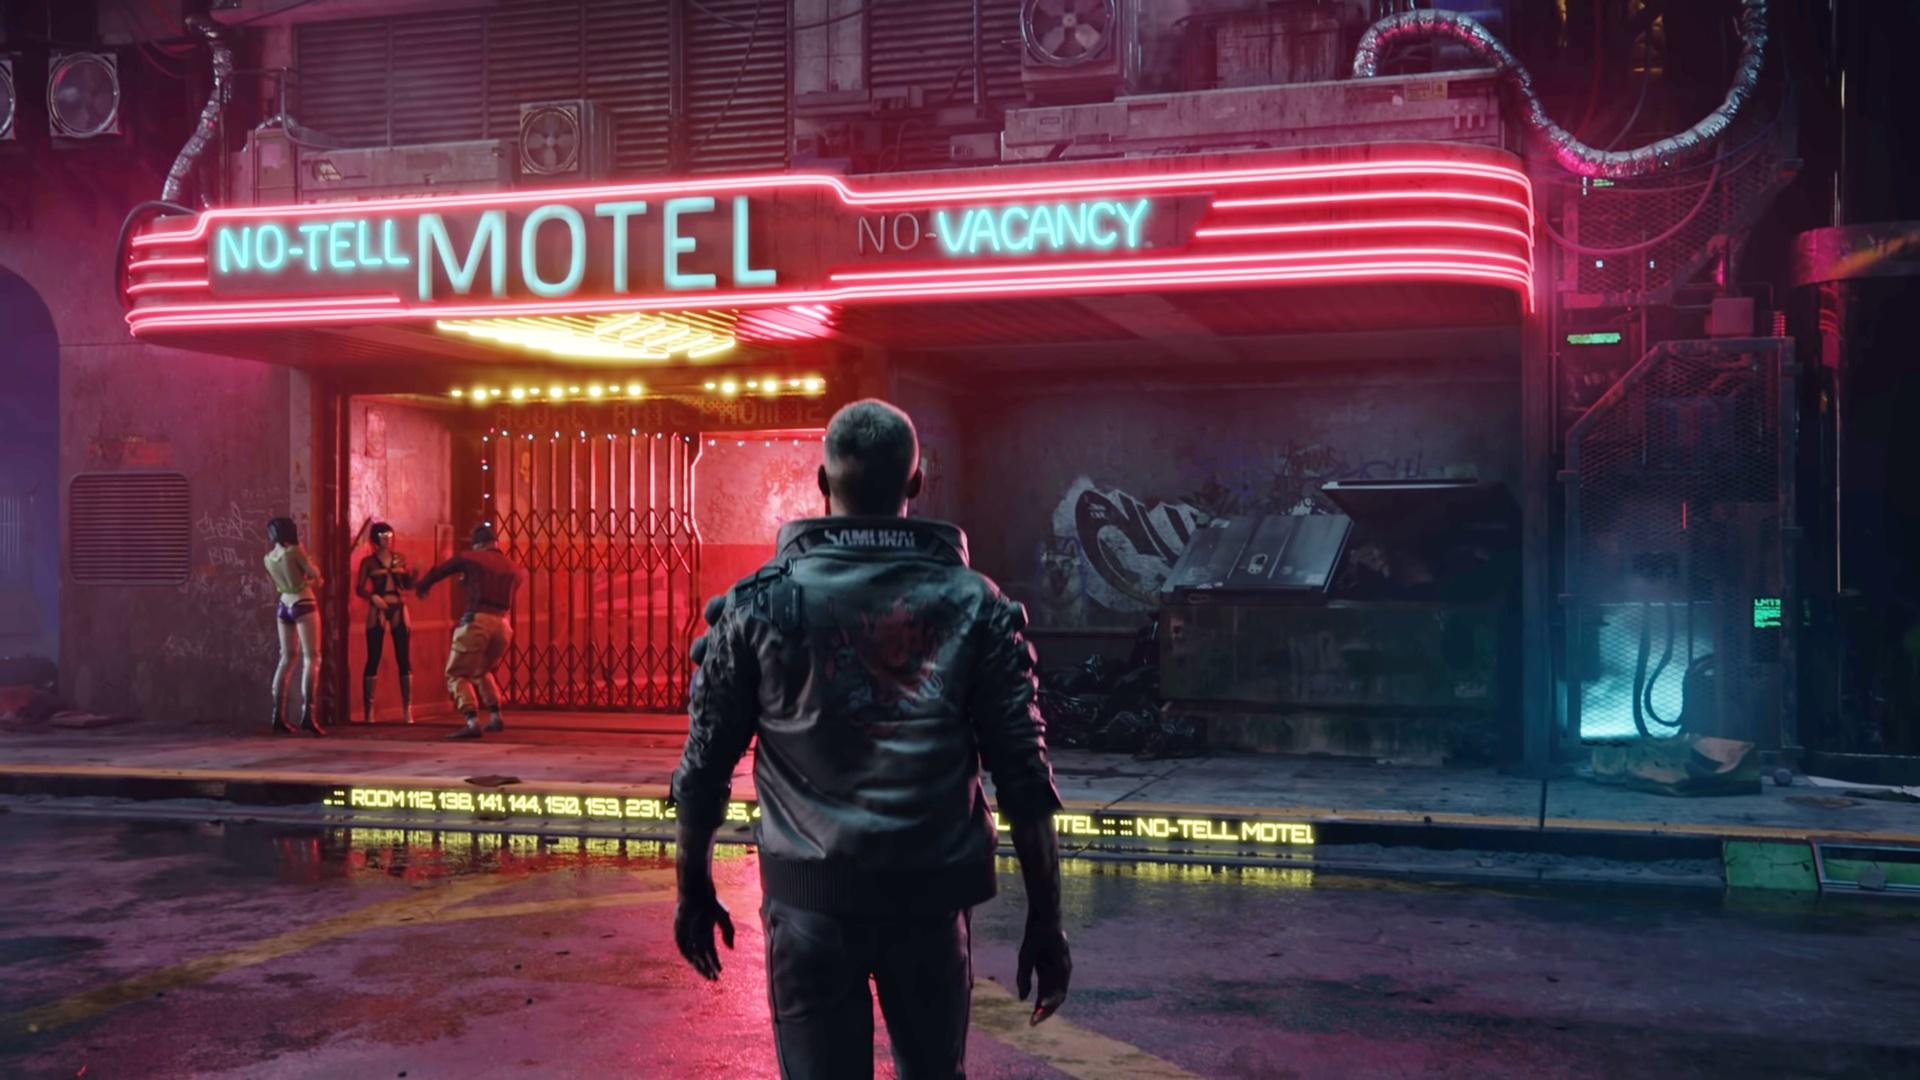 Don T Buy That 400 Cyberpunk 2077 E3 Jacket On Ebay Cdpr Says Pcgamesn